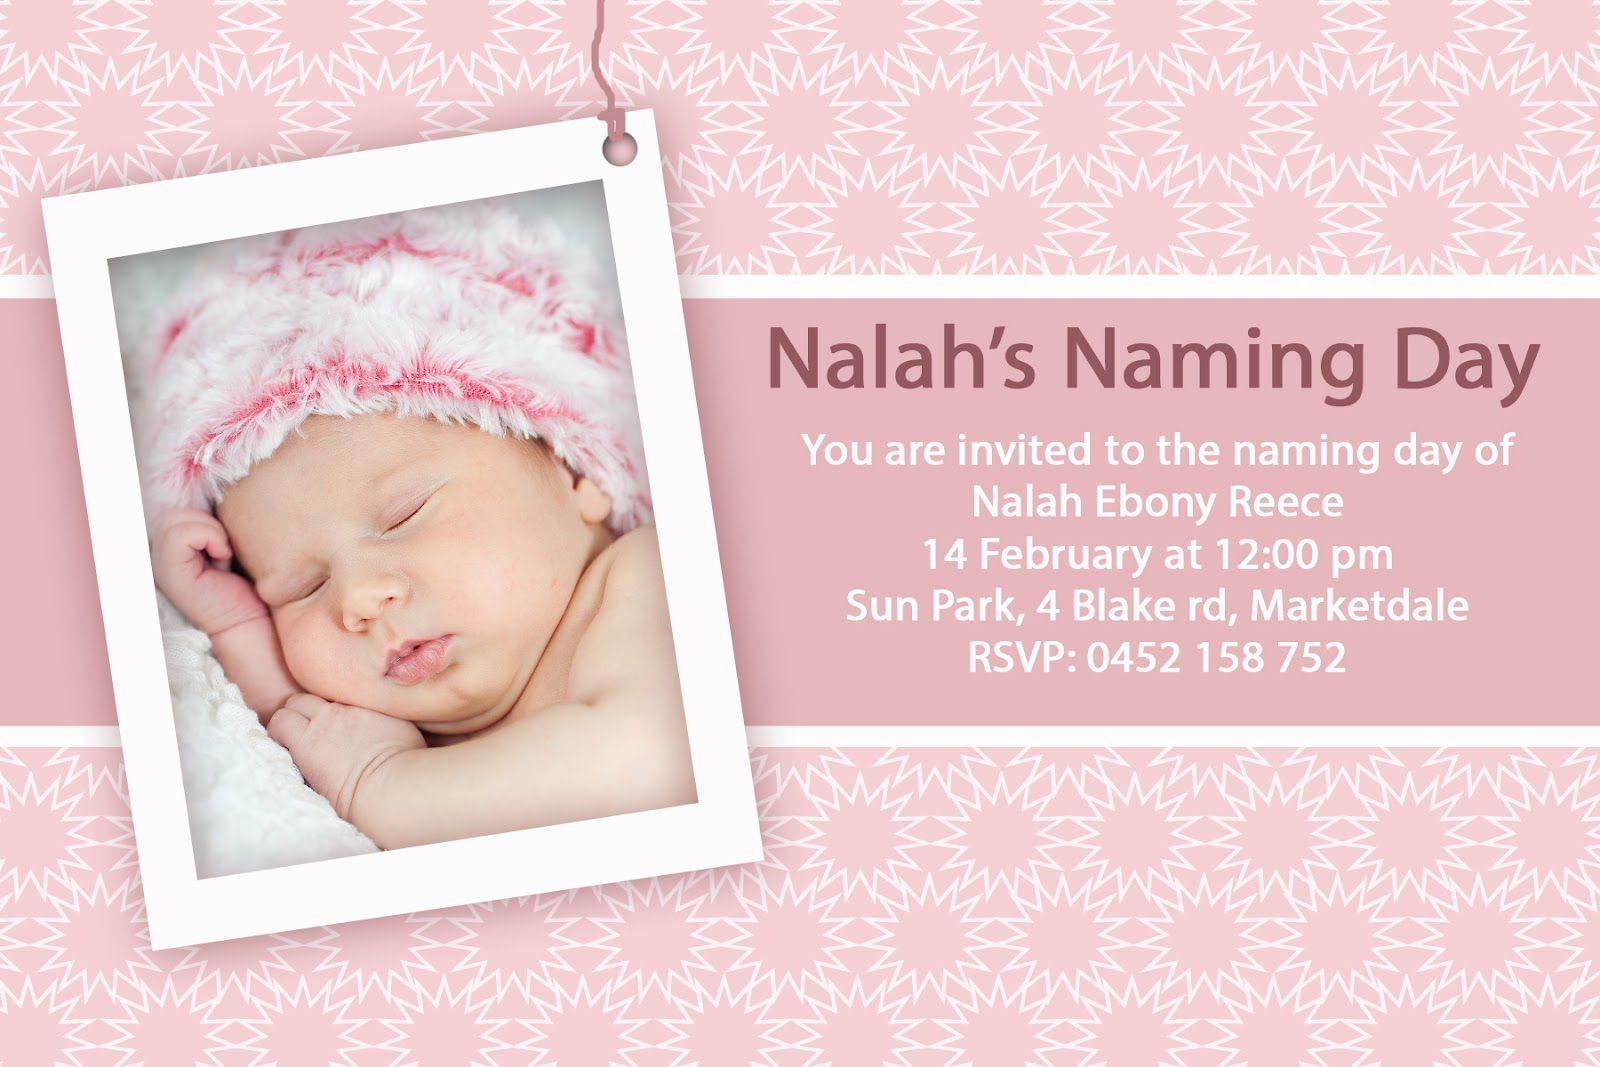 baby-christening-invitations | baptism invitations | Pinterest ...